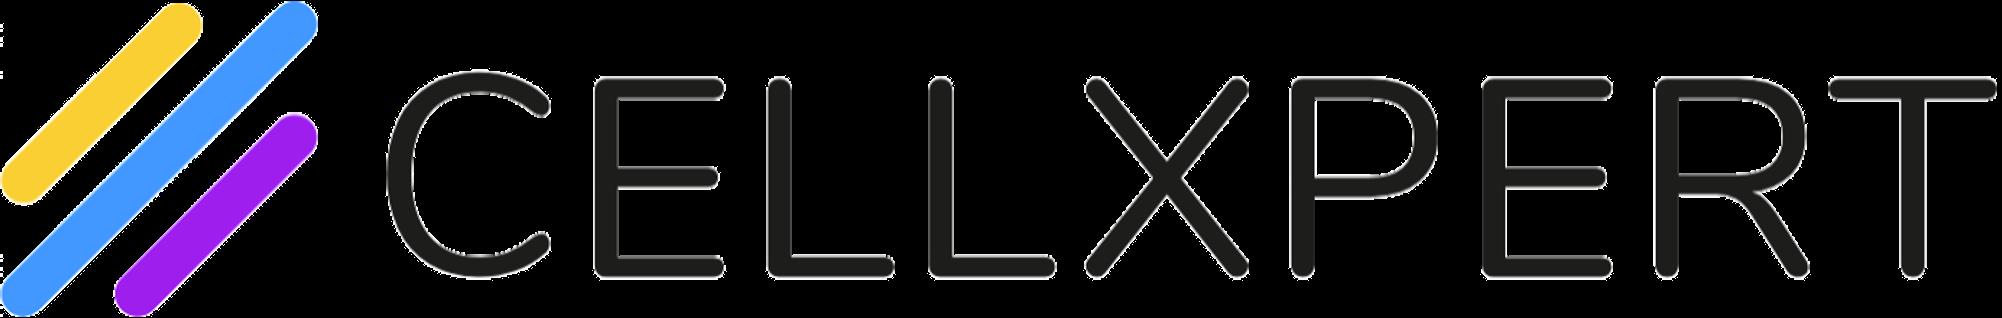 cellxpert-logo